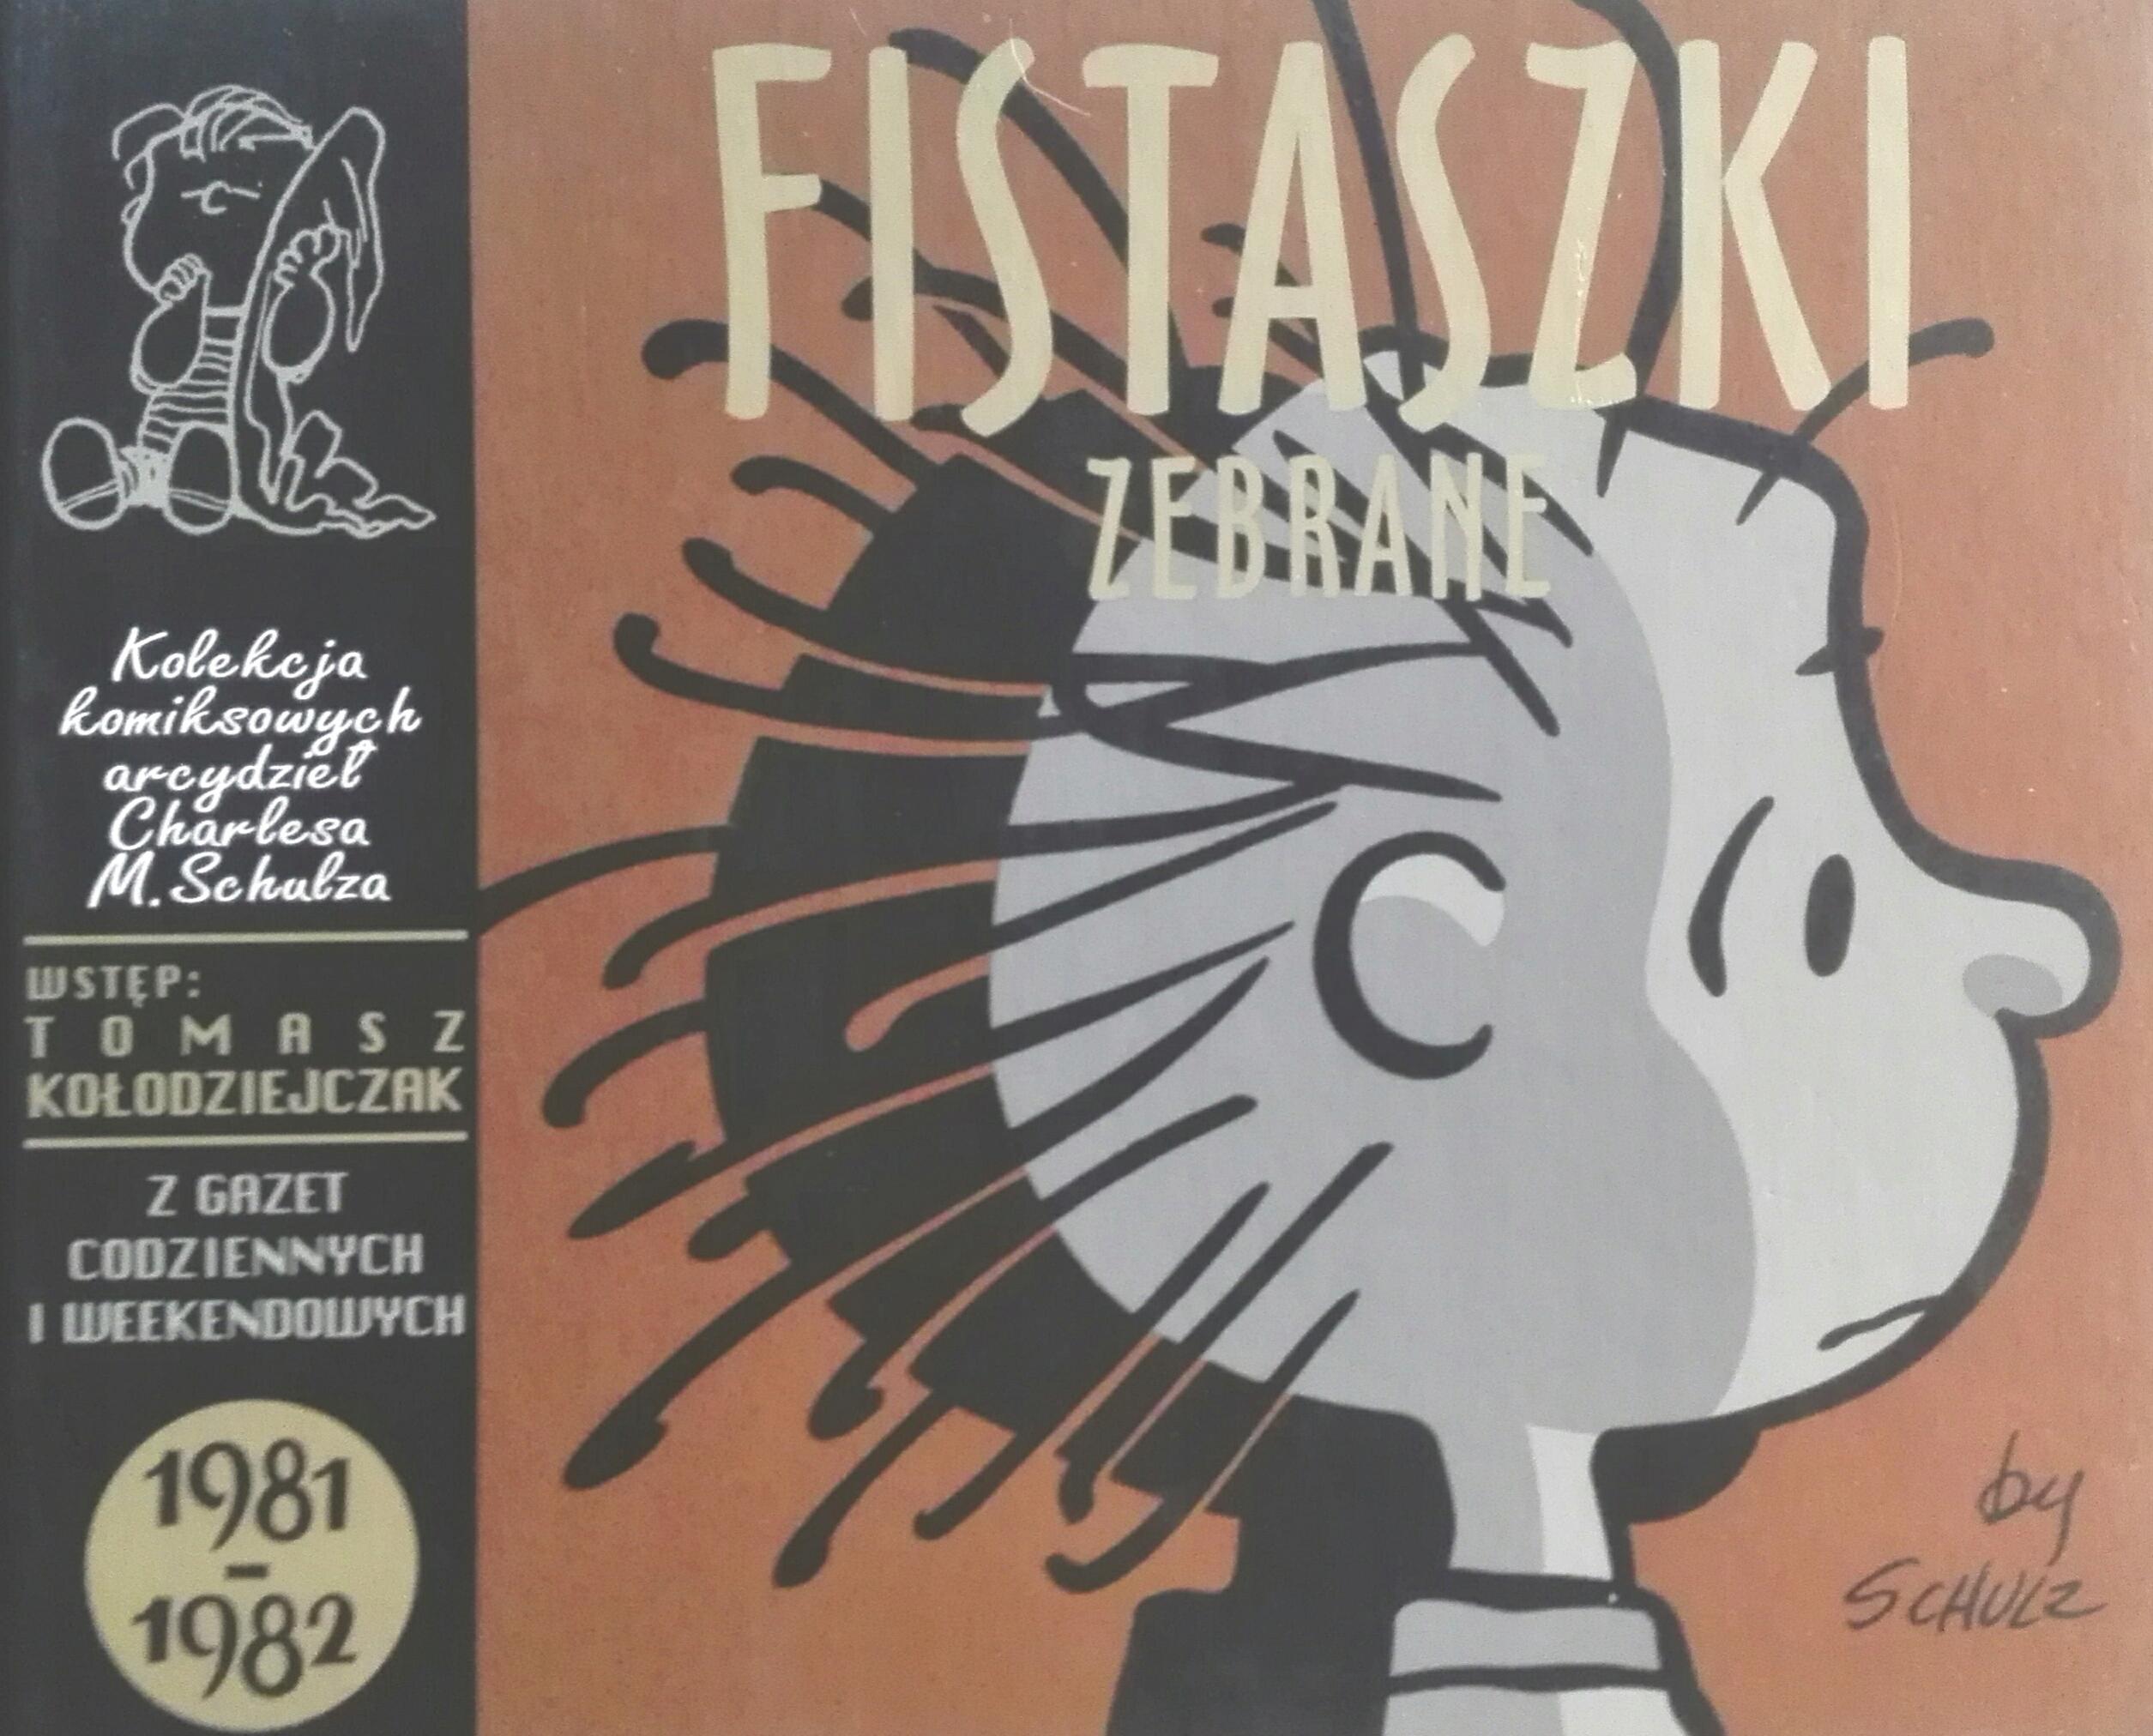 Fistaszki zebrane 1981-1982 Charles M. Schulz SPK